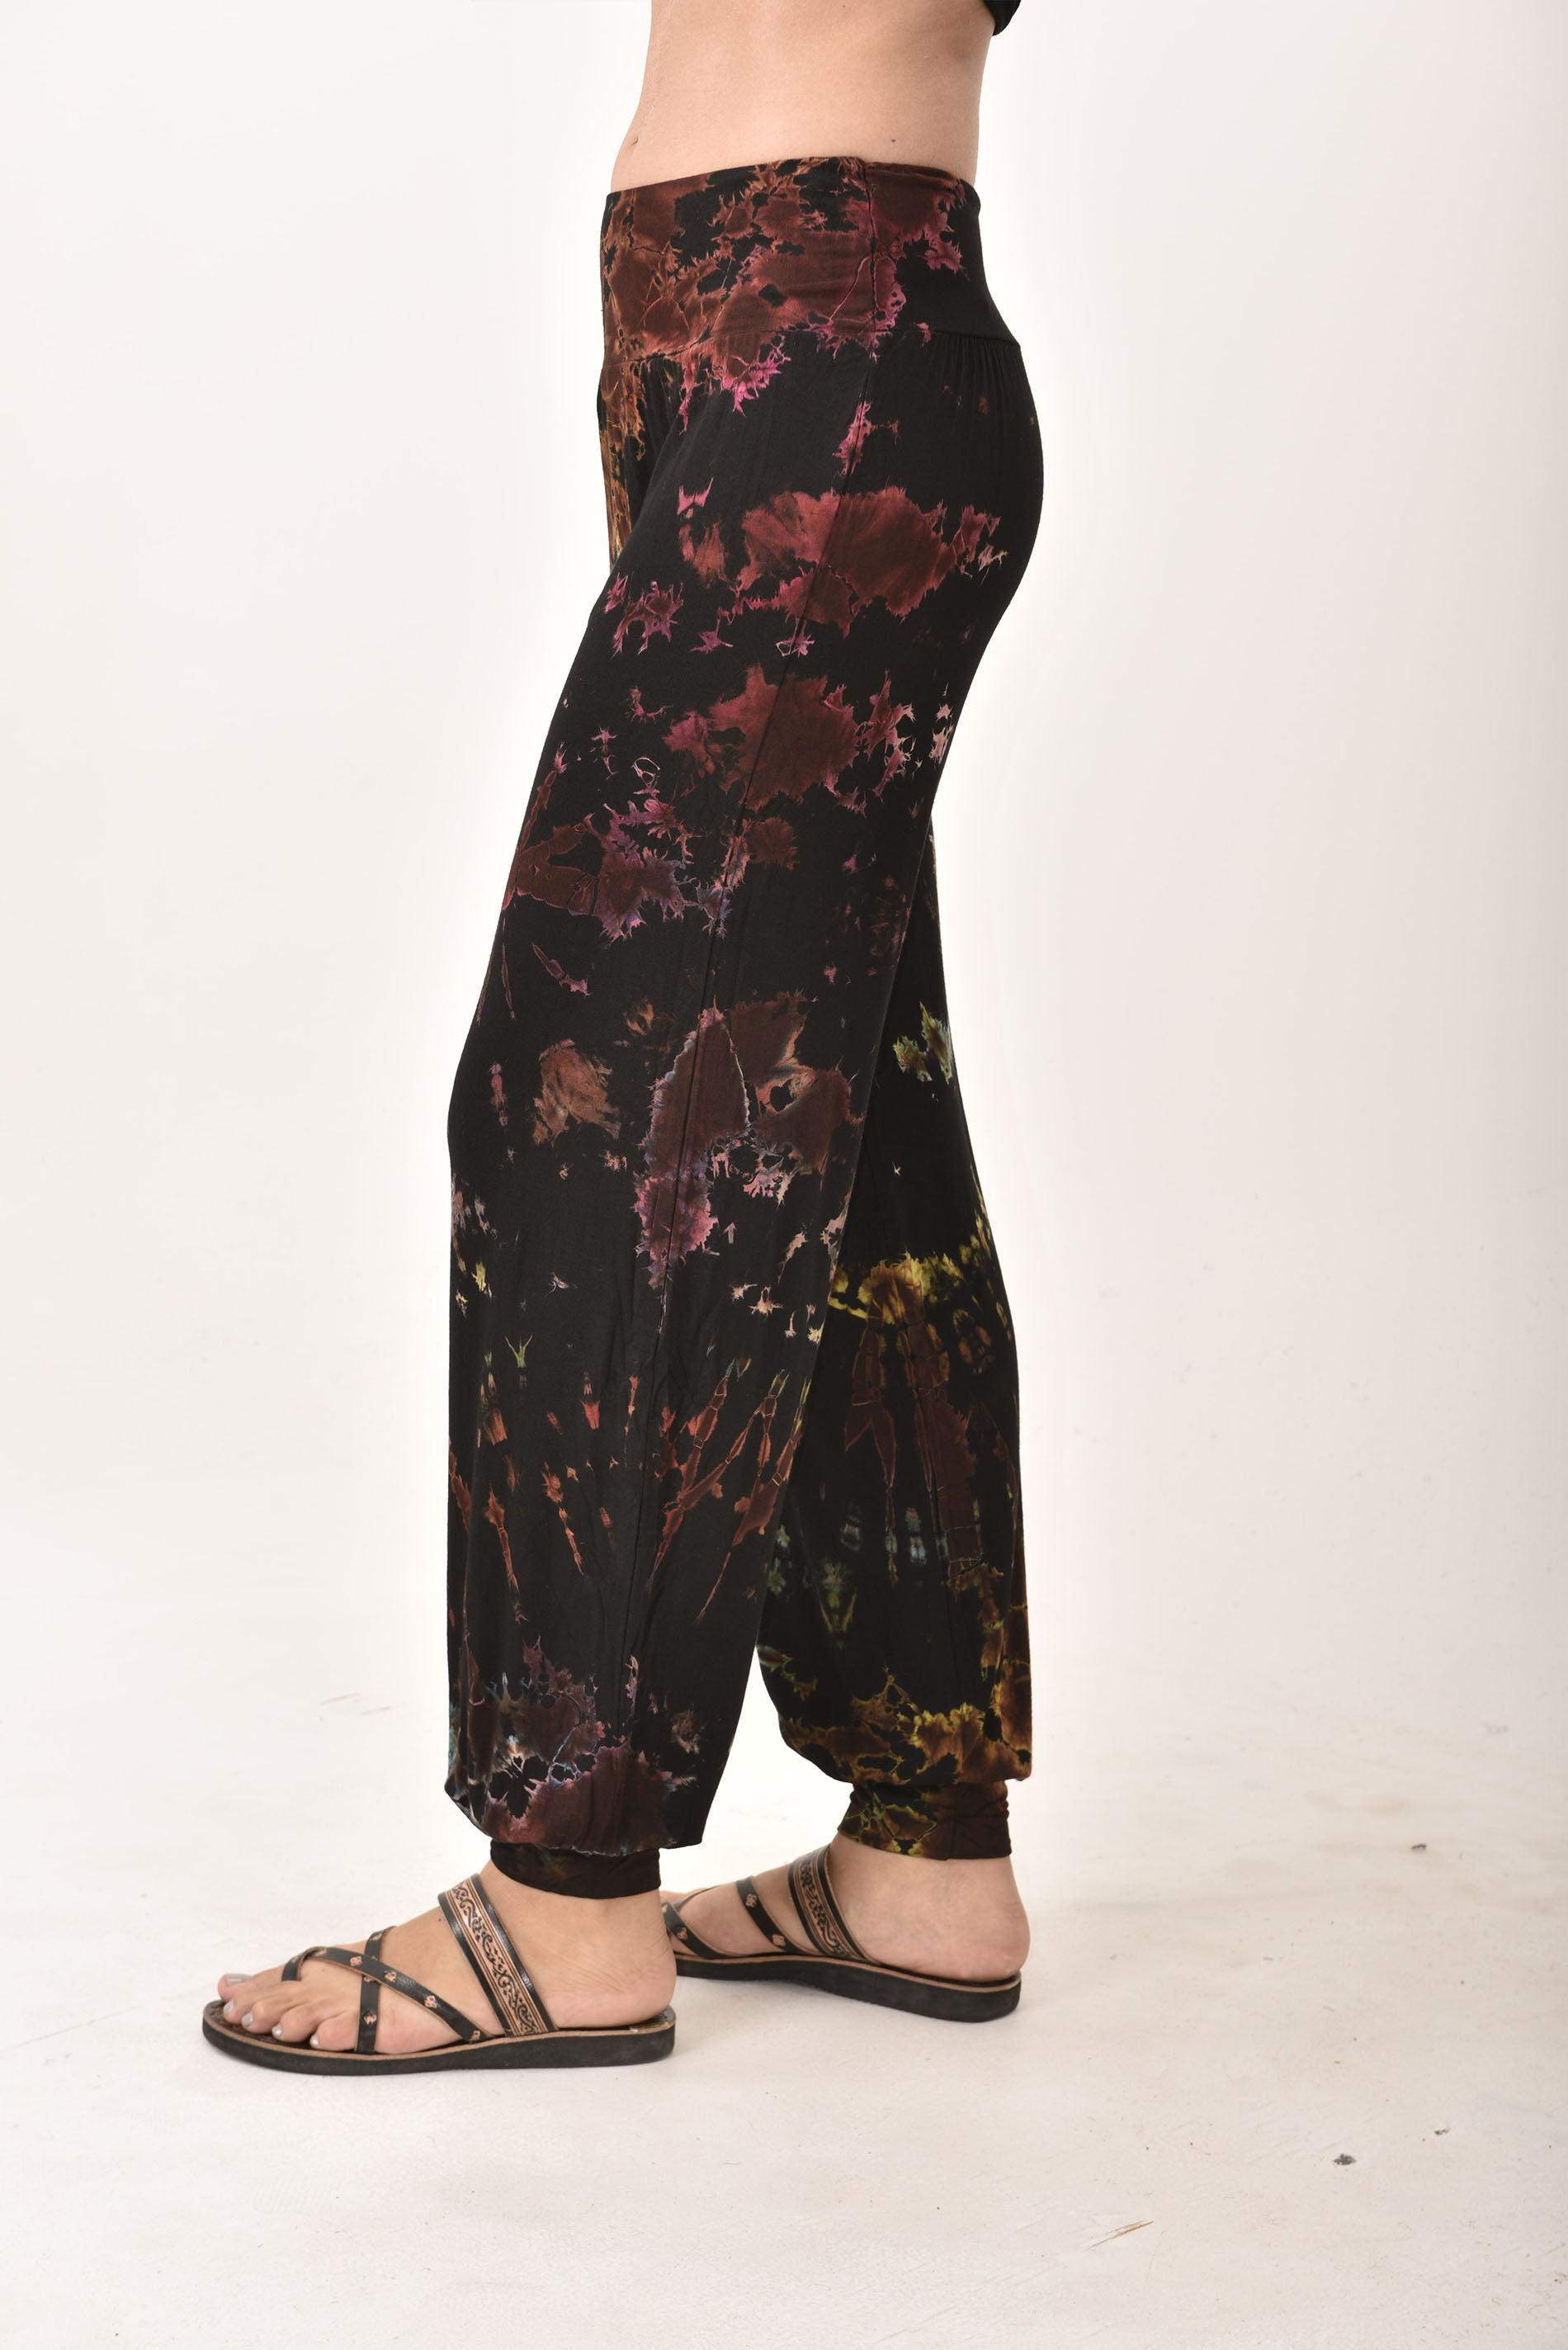 Hand Painted Tie Dye,Harem Pants , Black